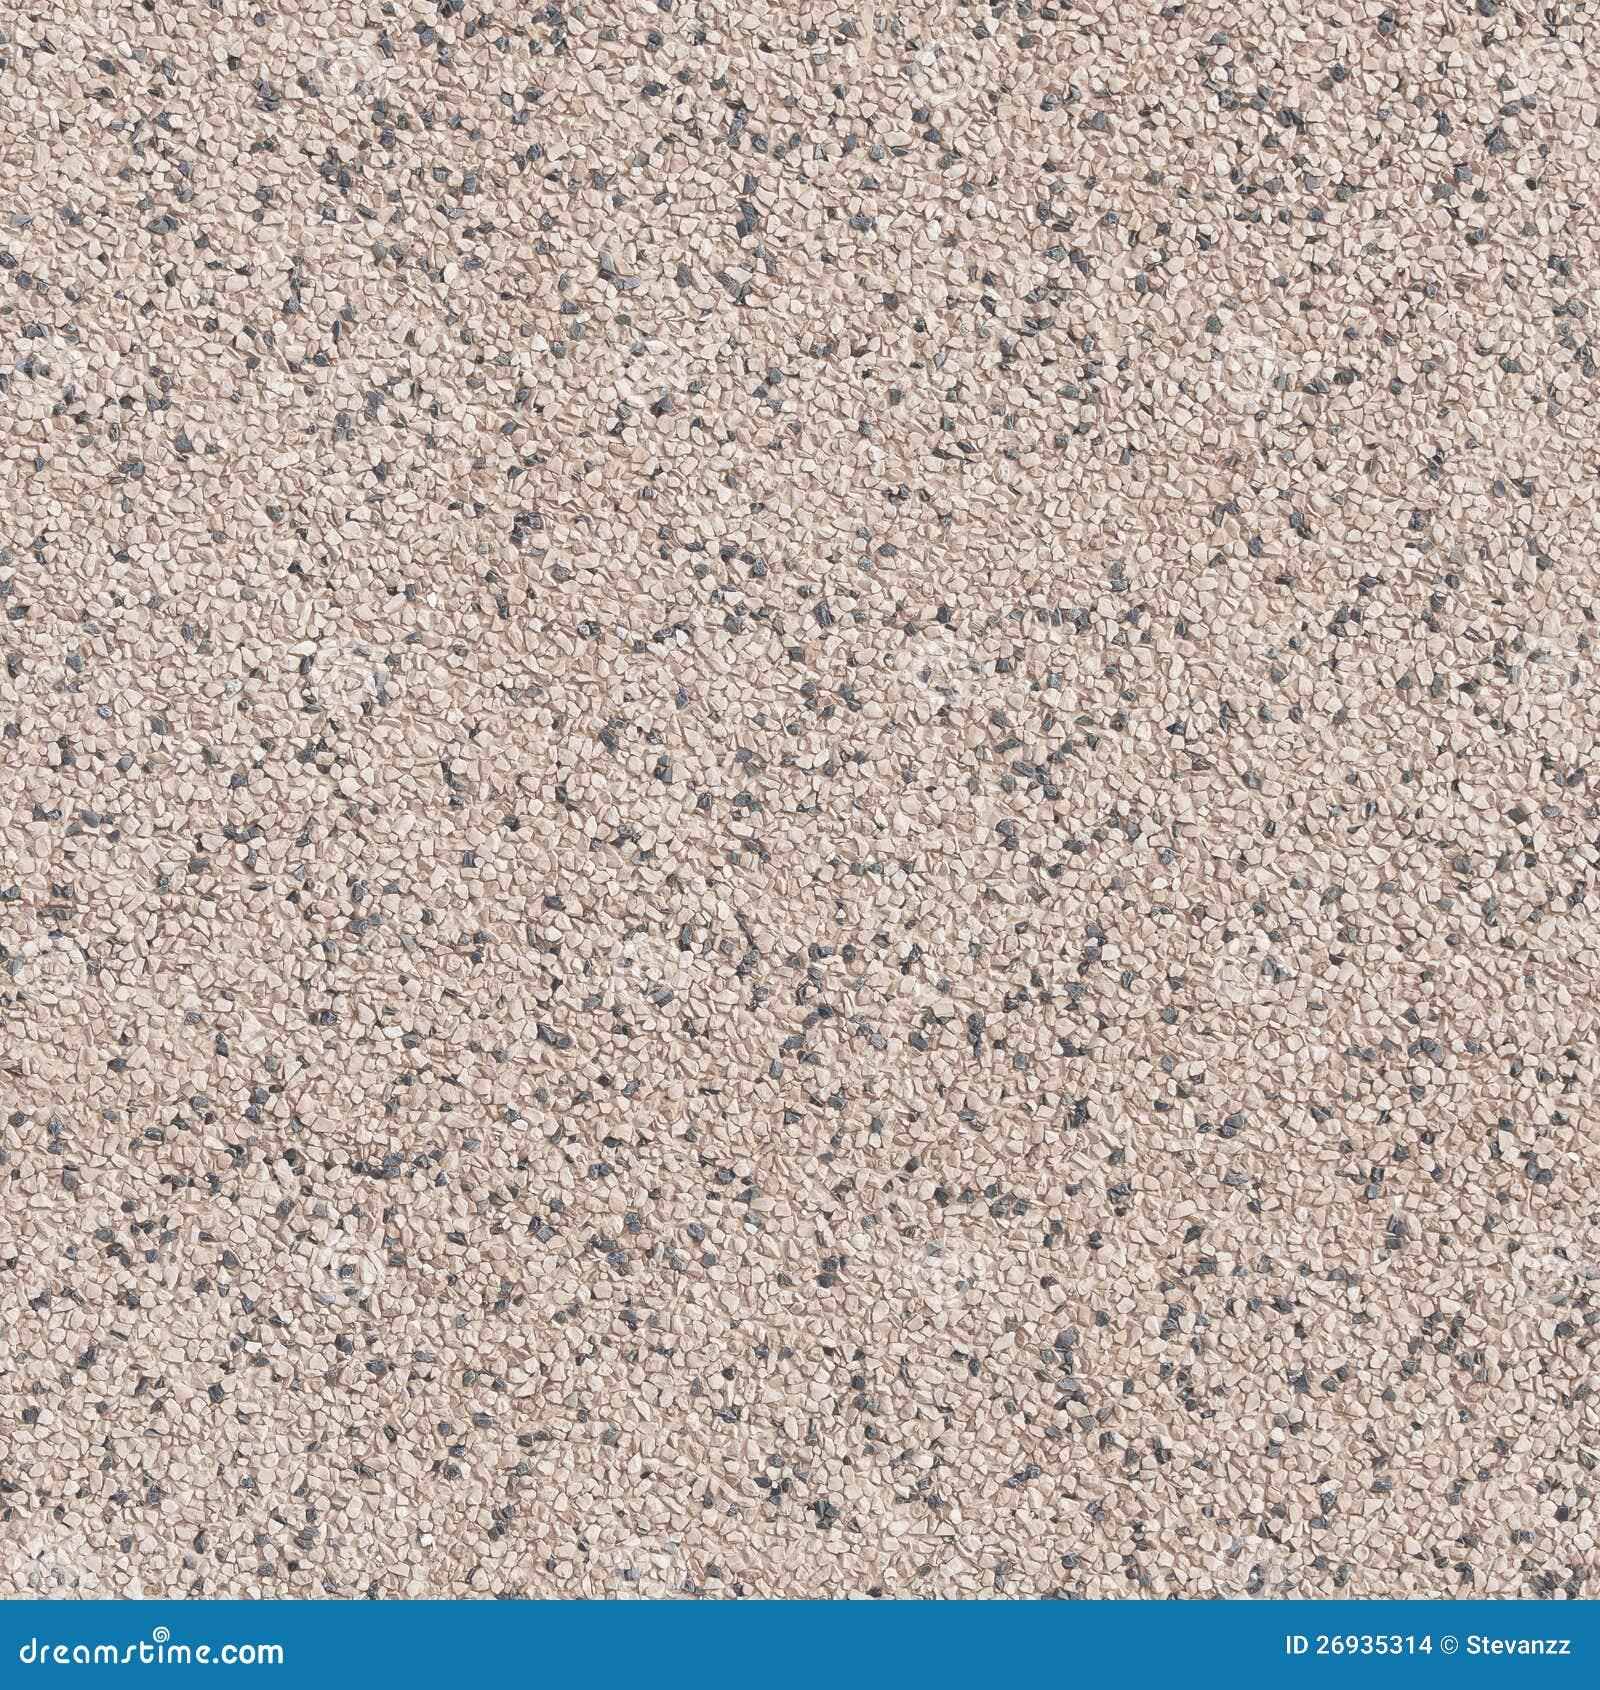 Pebble stone tile surface background.